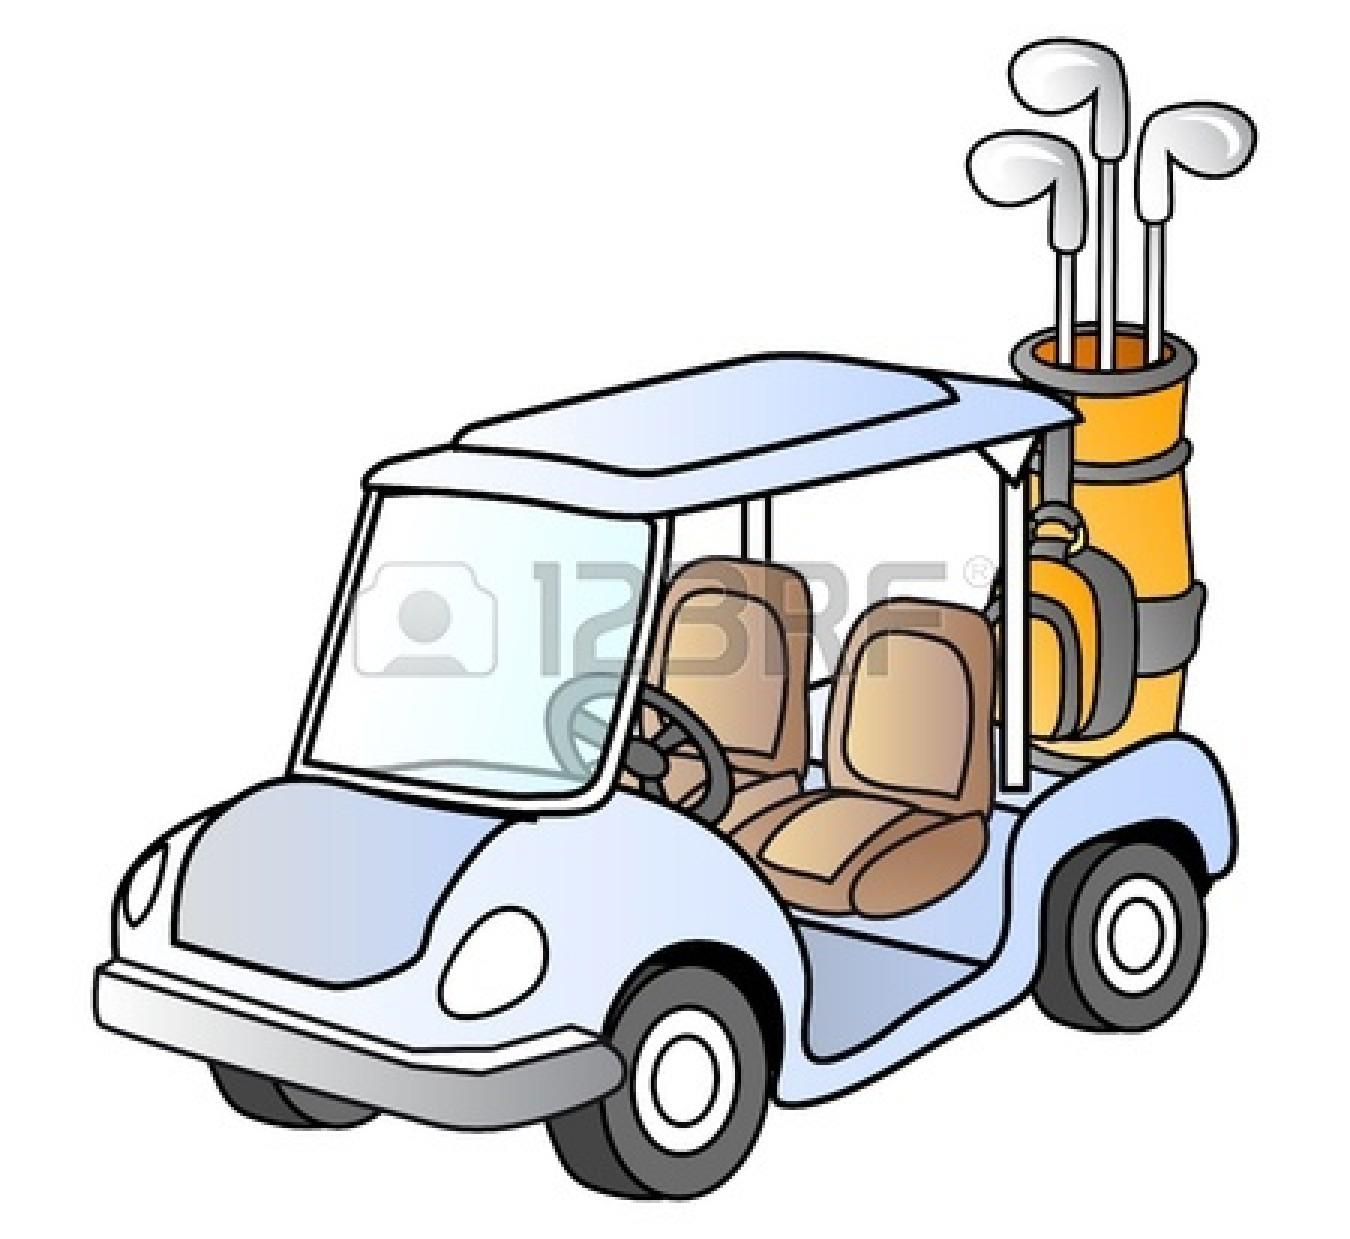 1350x1239 Pics Photos Golf Cart Clip Art